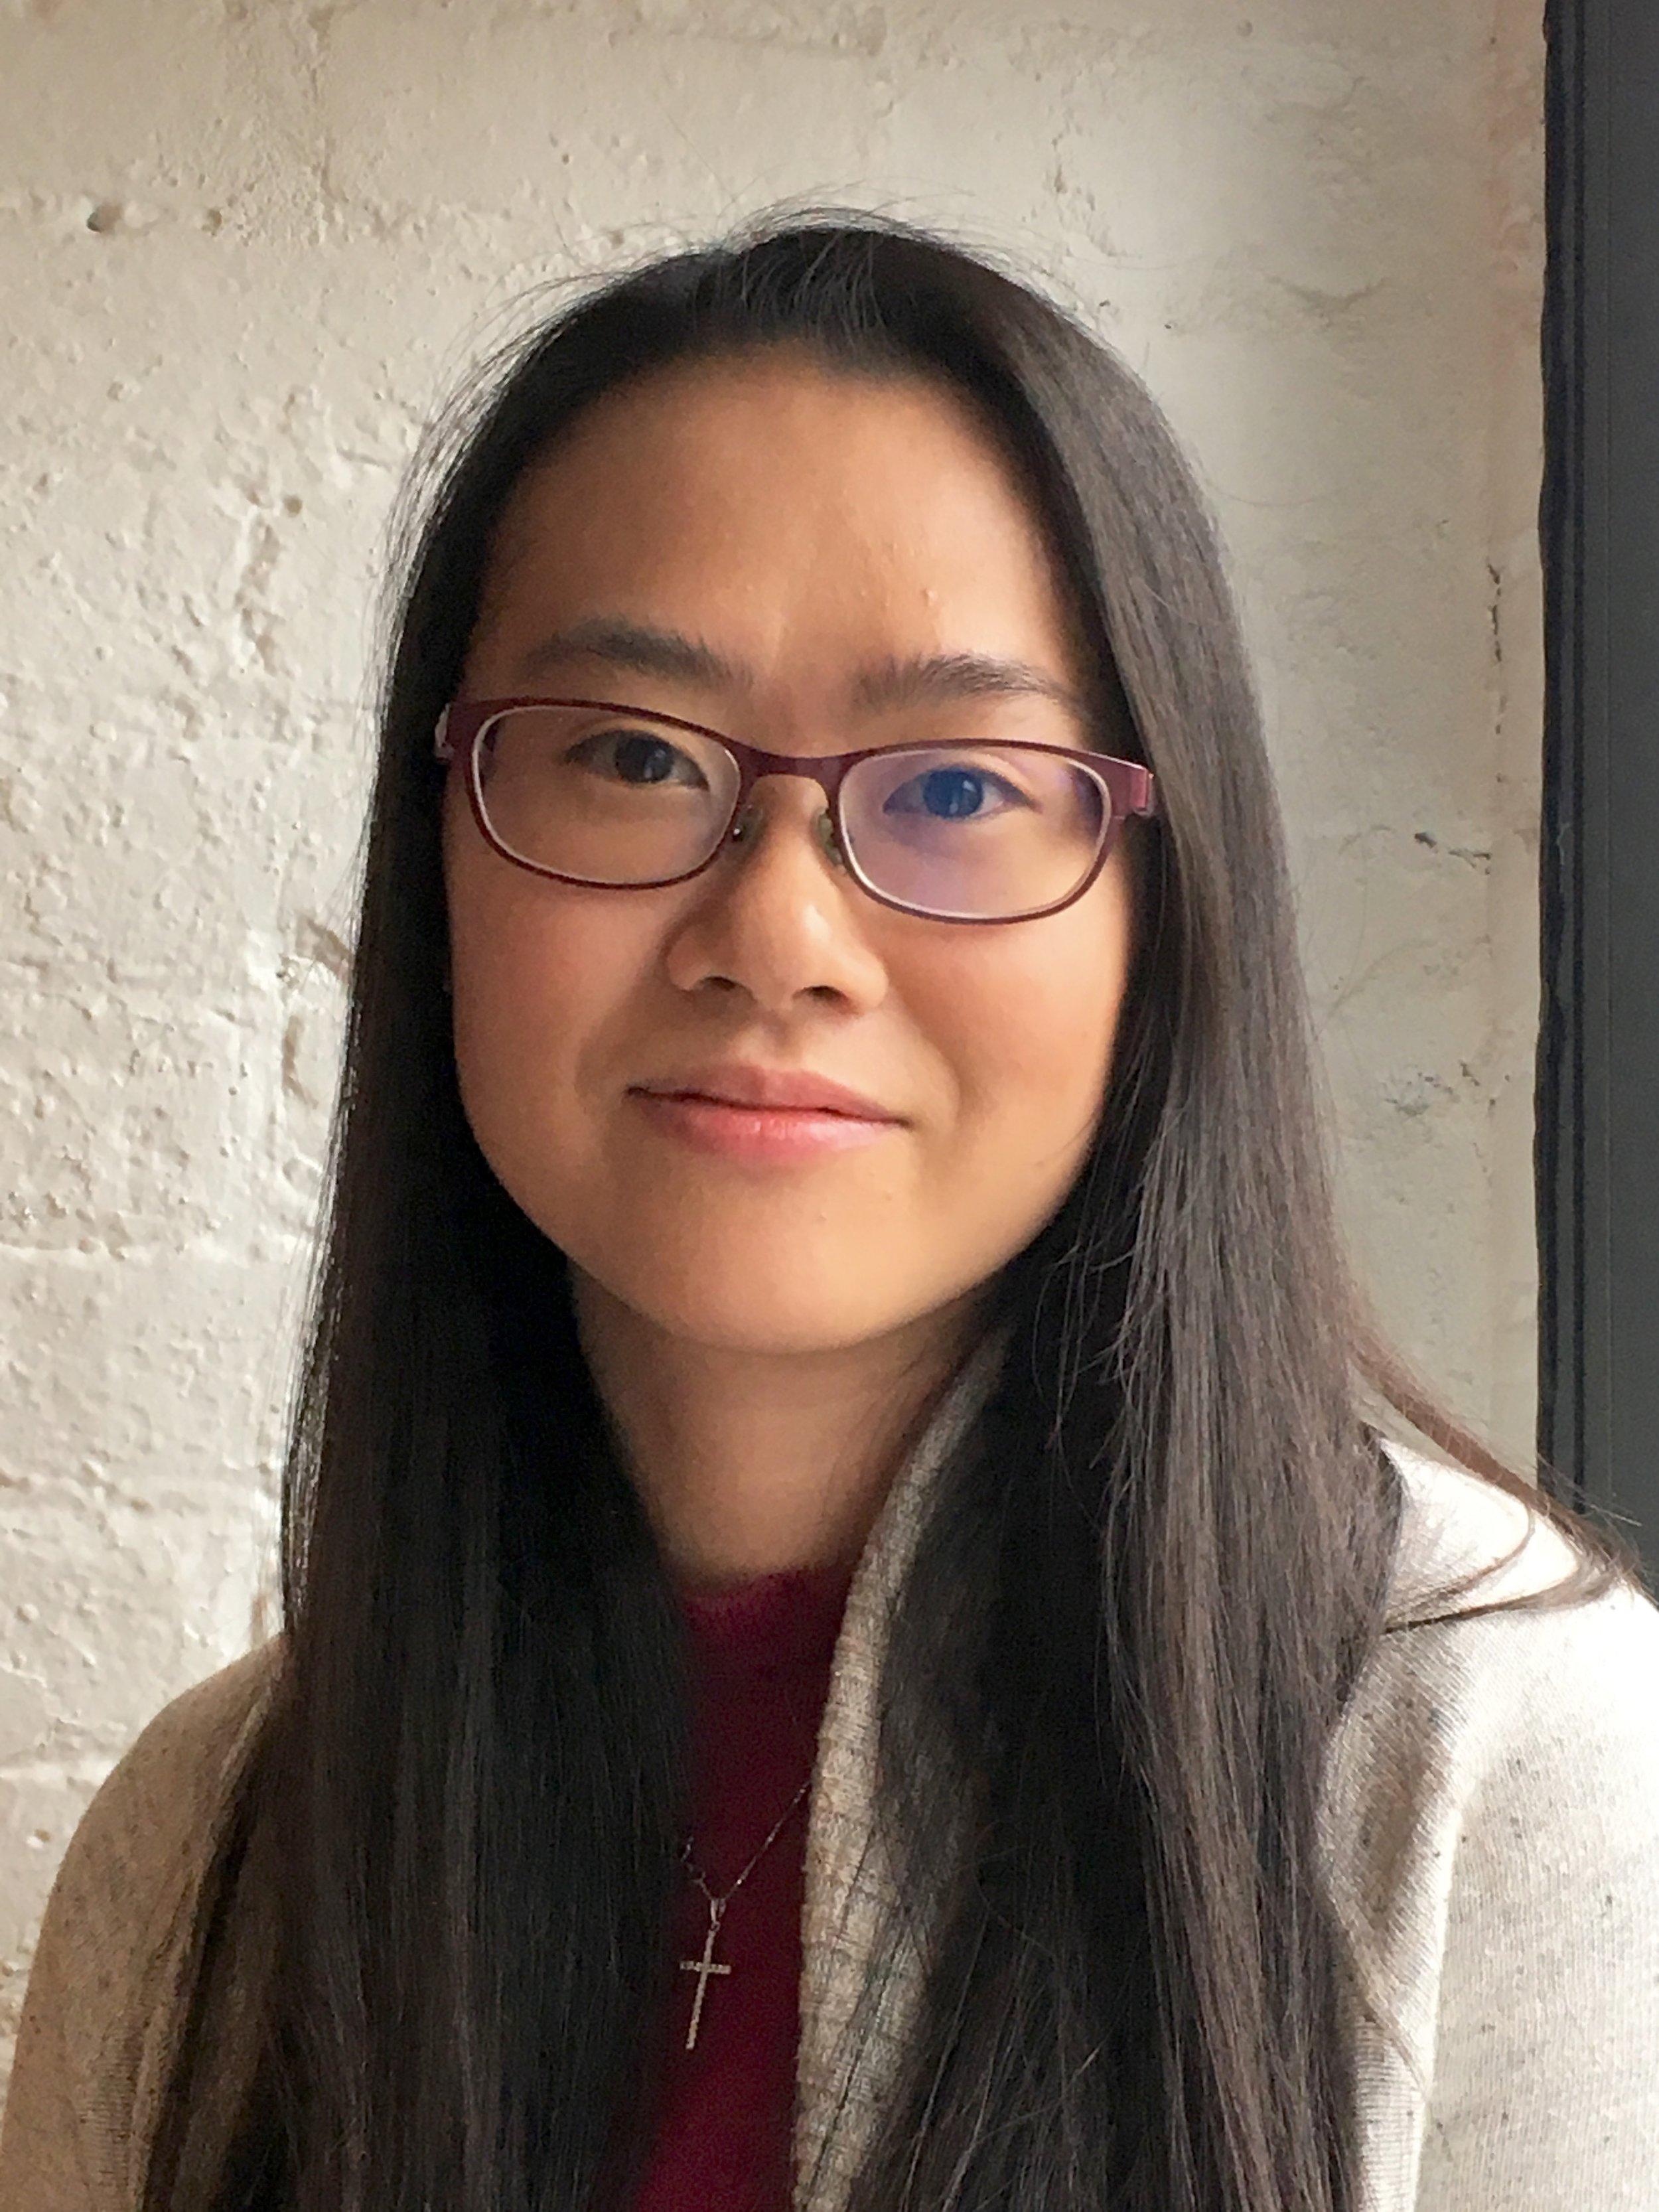 Yuk (Erica) Pang, Research Associate